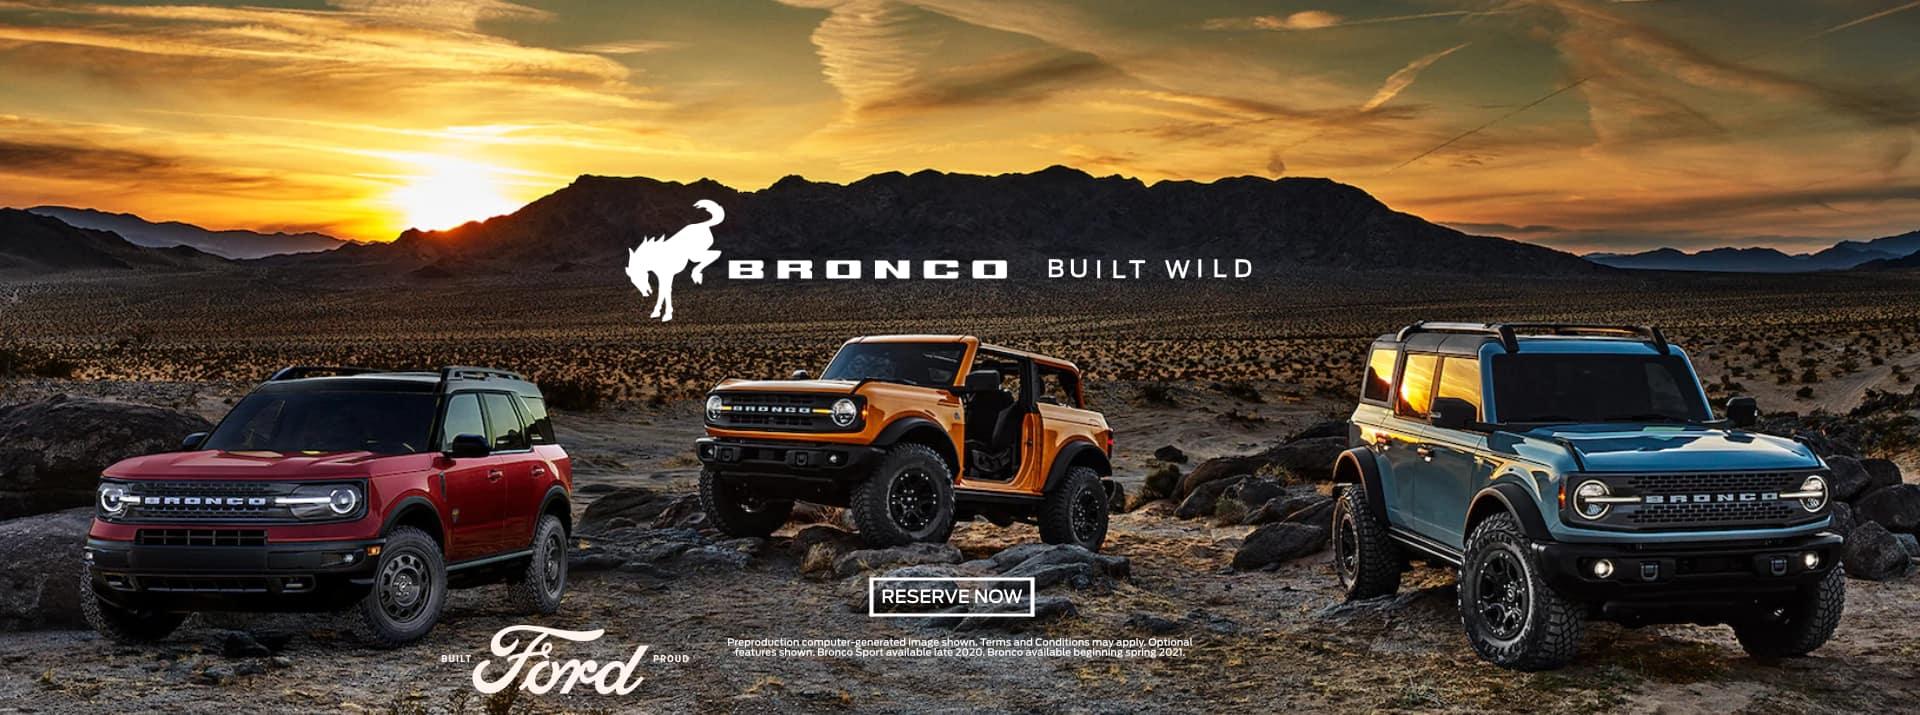 Bronco Built To Wild